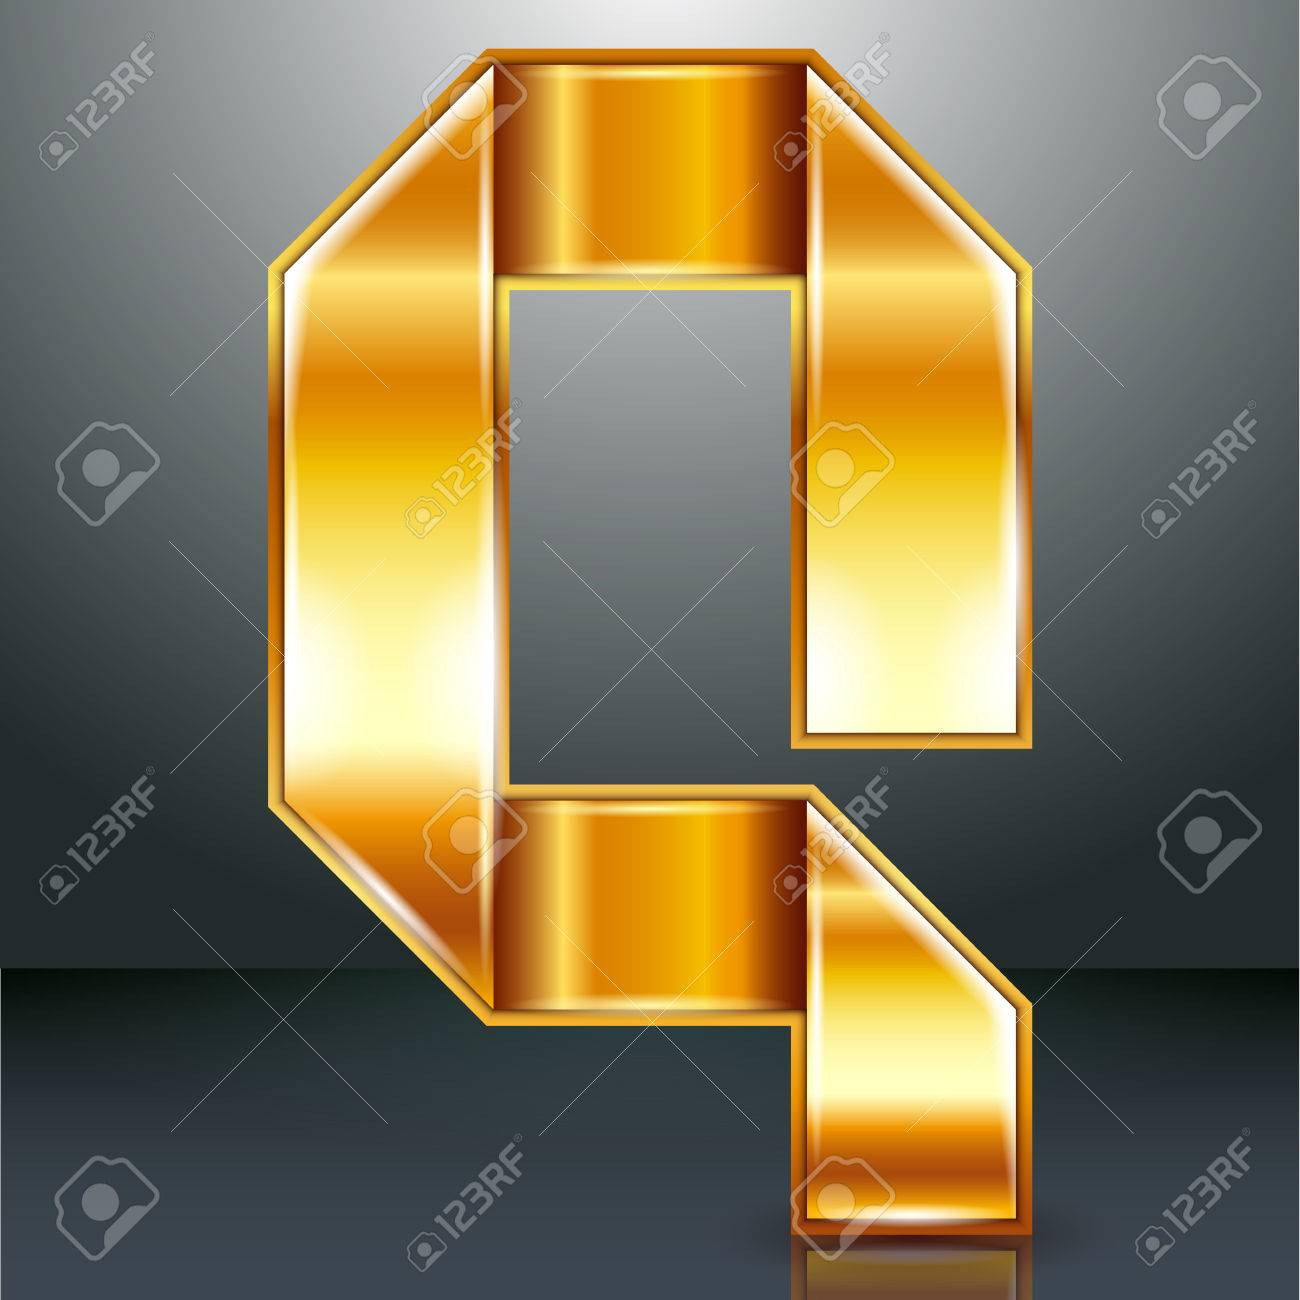 Font folded from a golden metallic ribbon - Letter Q. Vector illustration . Stock Vector - 22735526